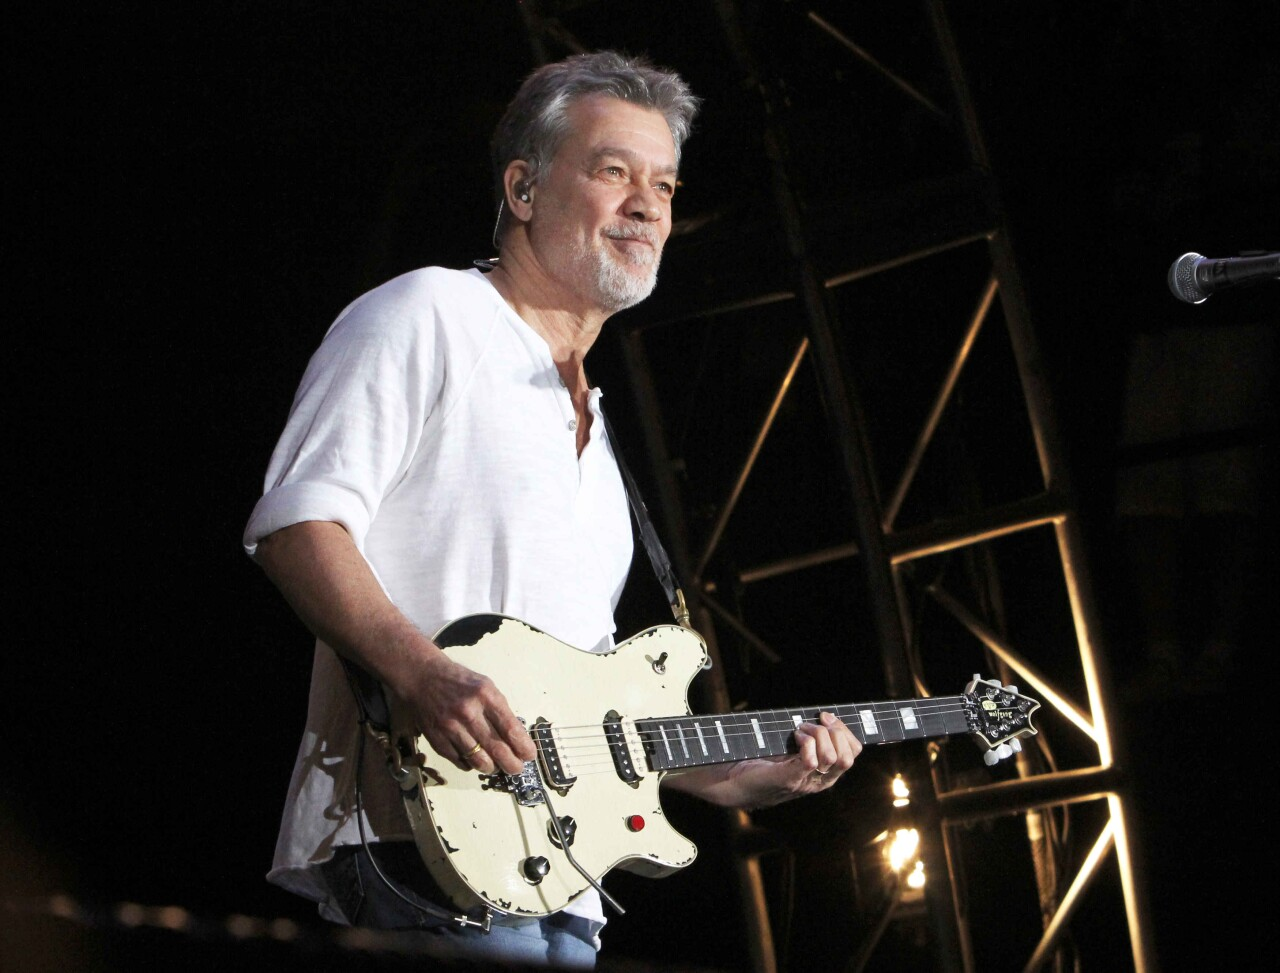 Eddie Van Halen in 2015